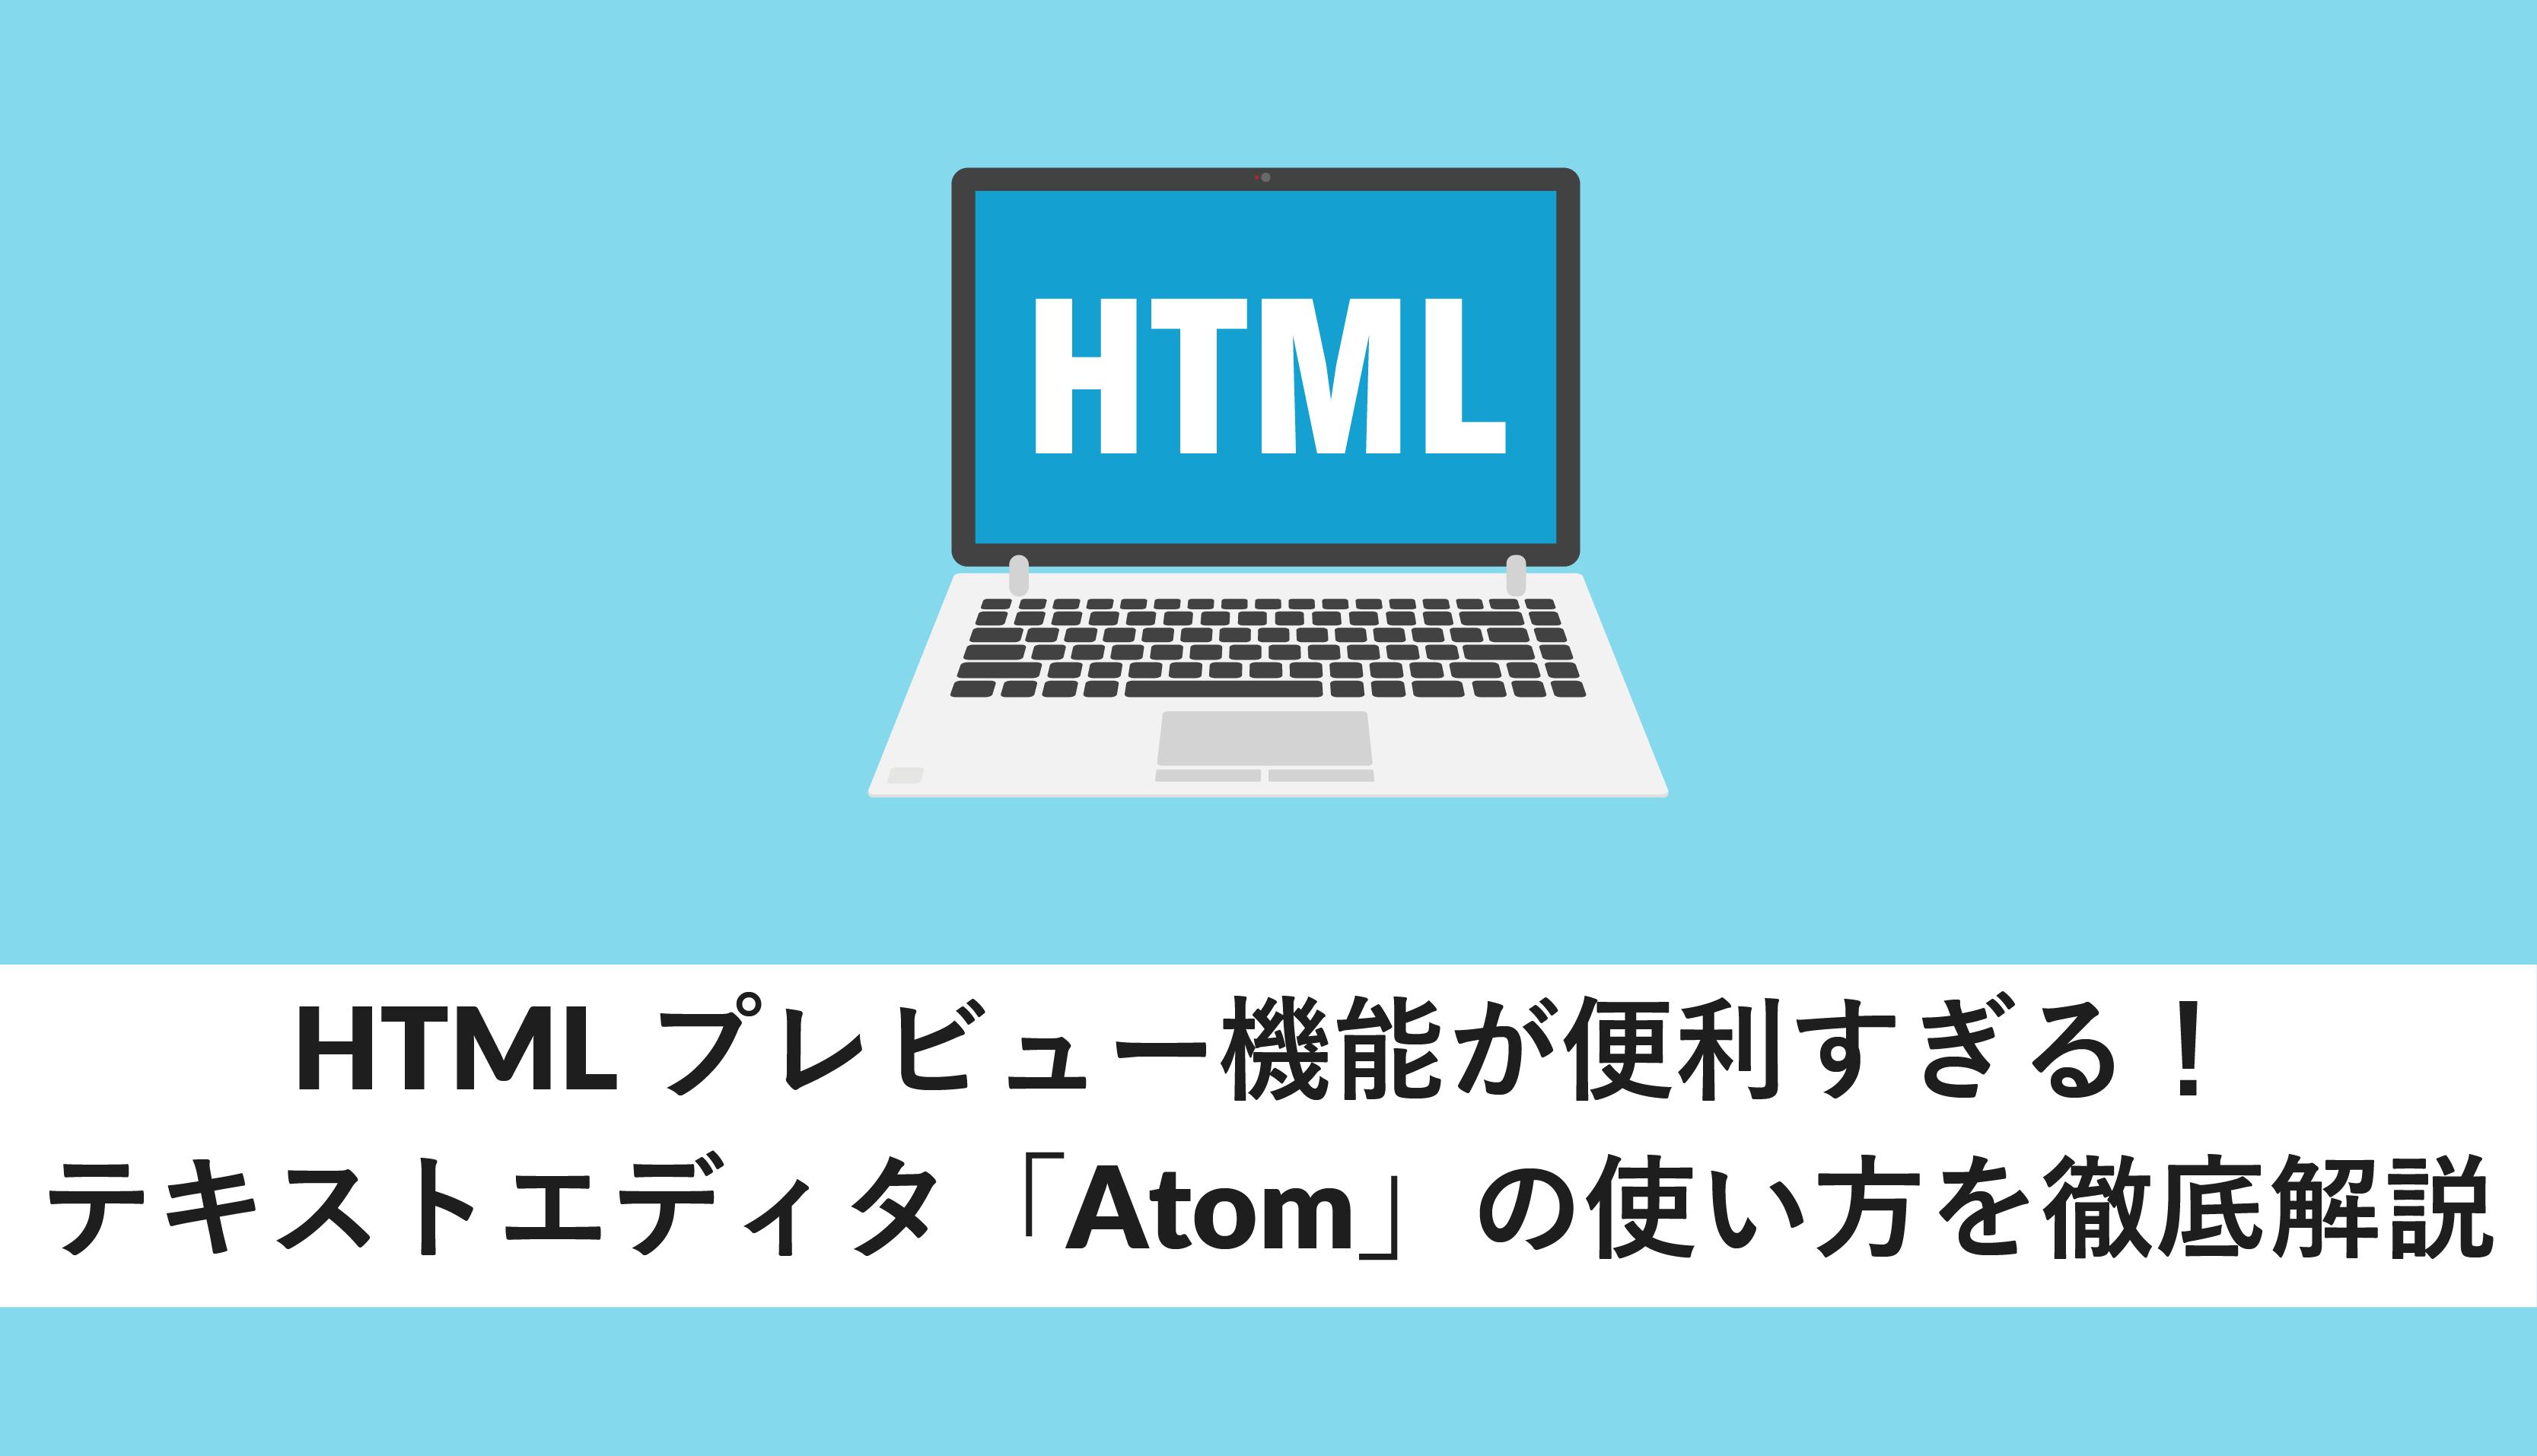 atom html